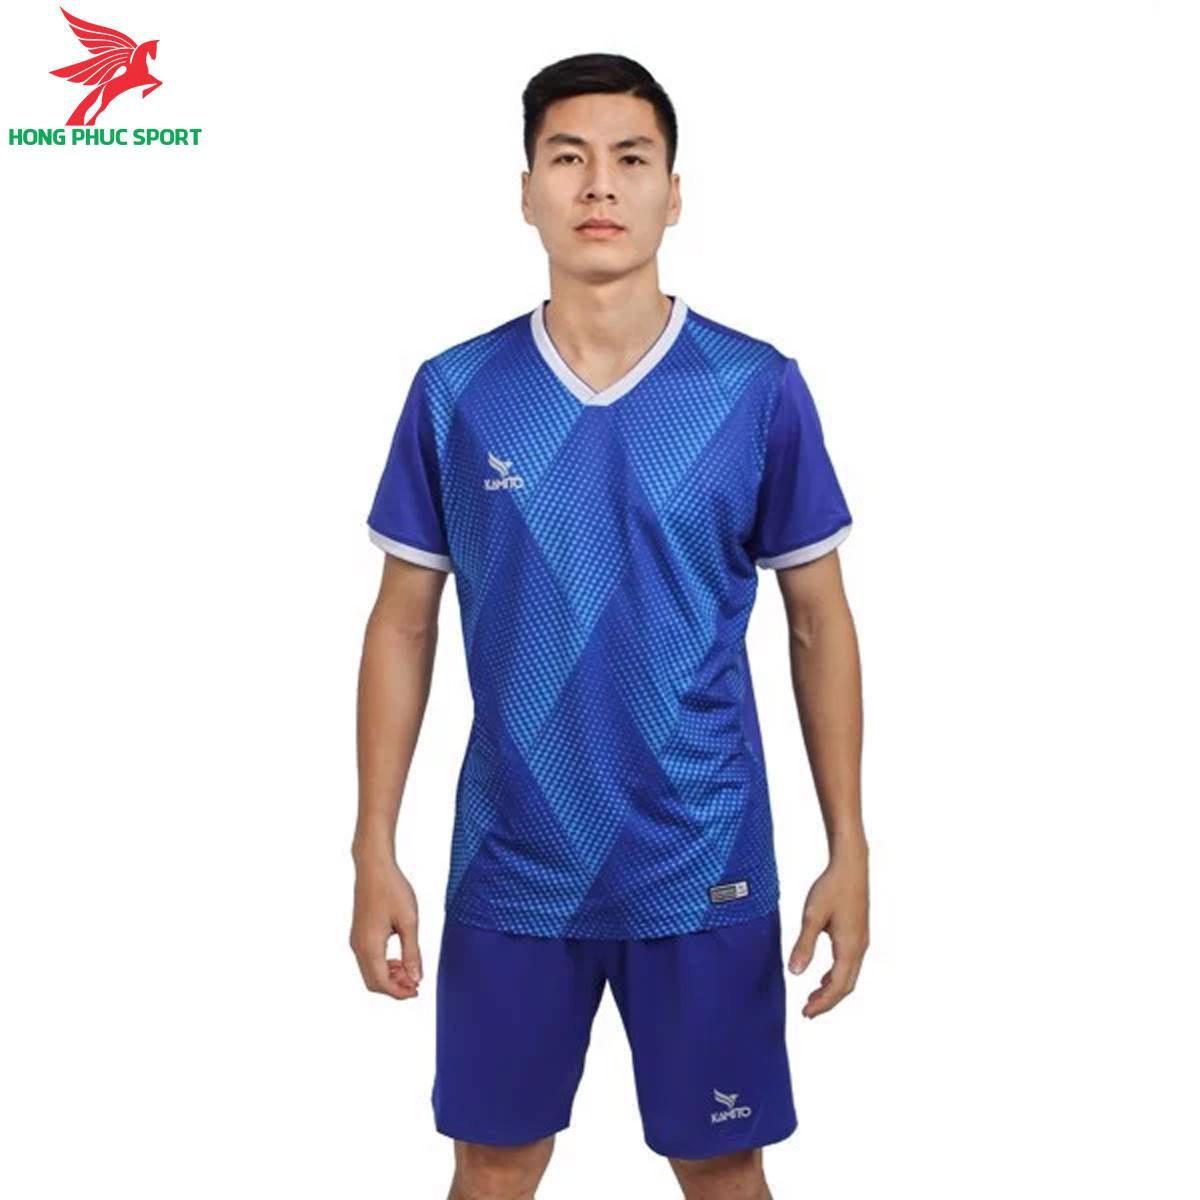 https://cdn.hongphucsport.com/unsafe/s4.shopbay.vn/files/285/ao-khong-logo-kamito-msh2101-mau-xanh-duong-1-6052db2118b3a.jpg